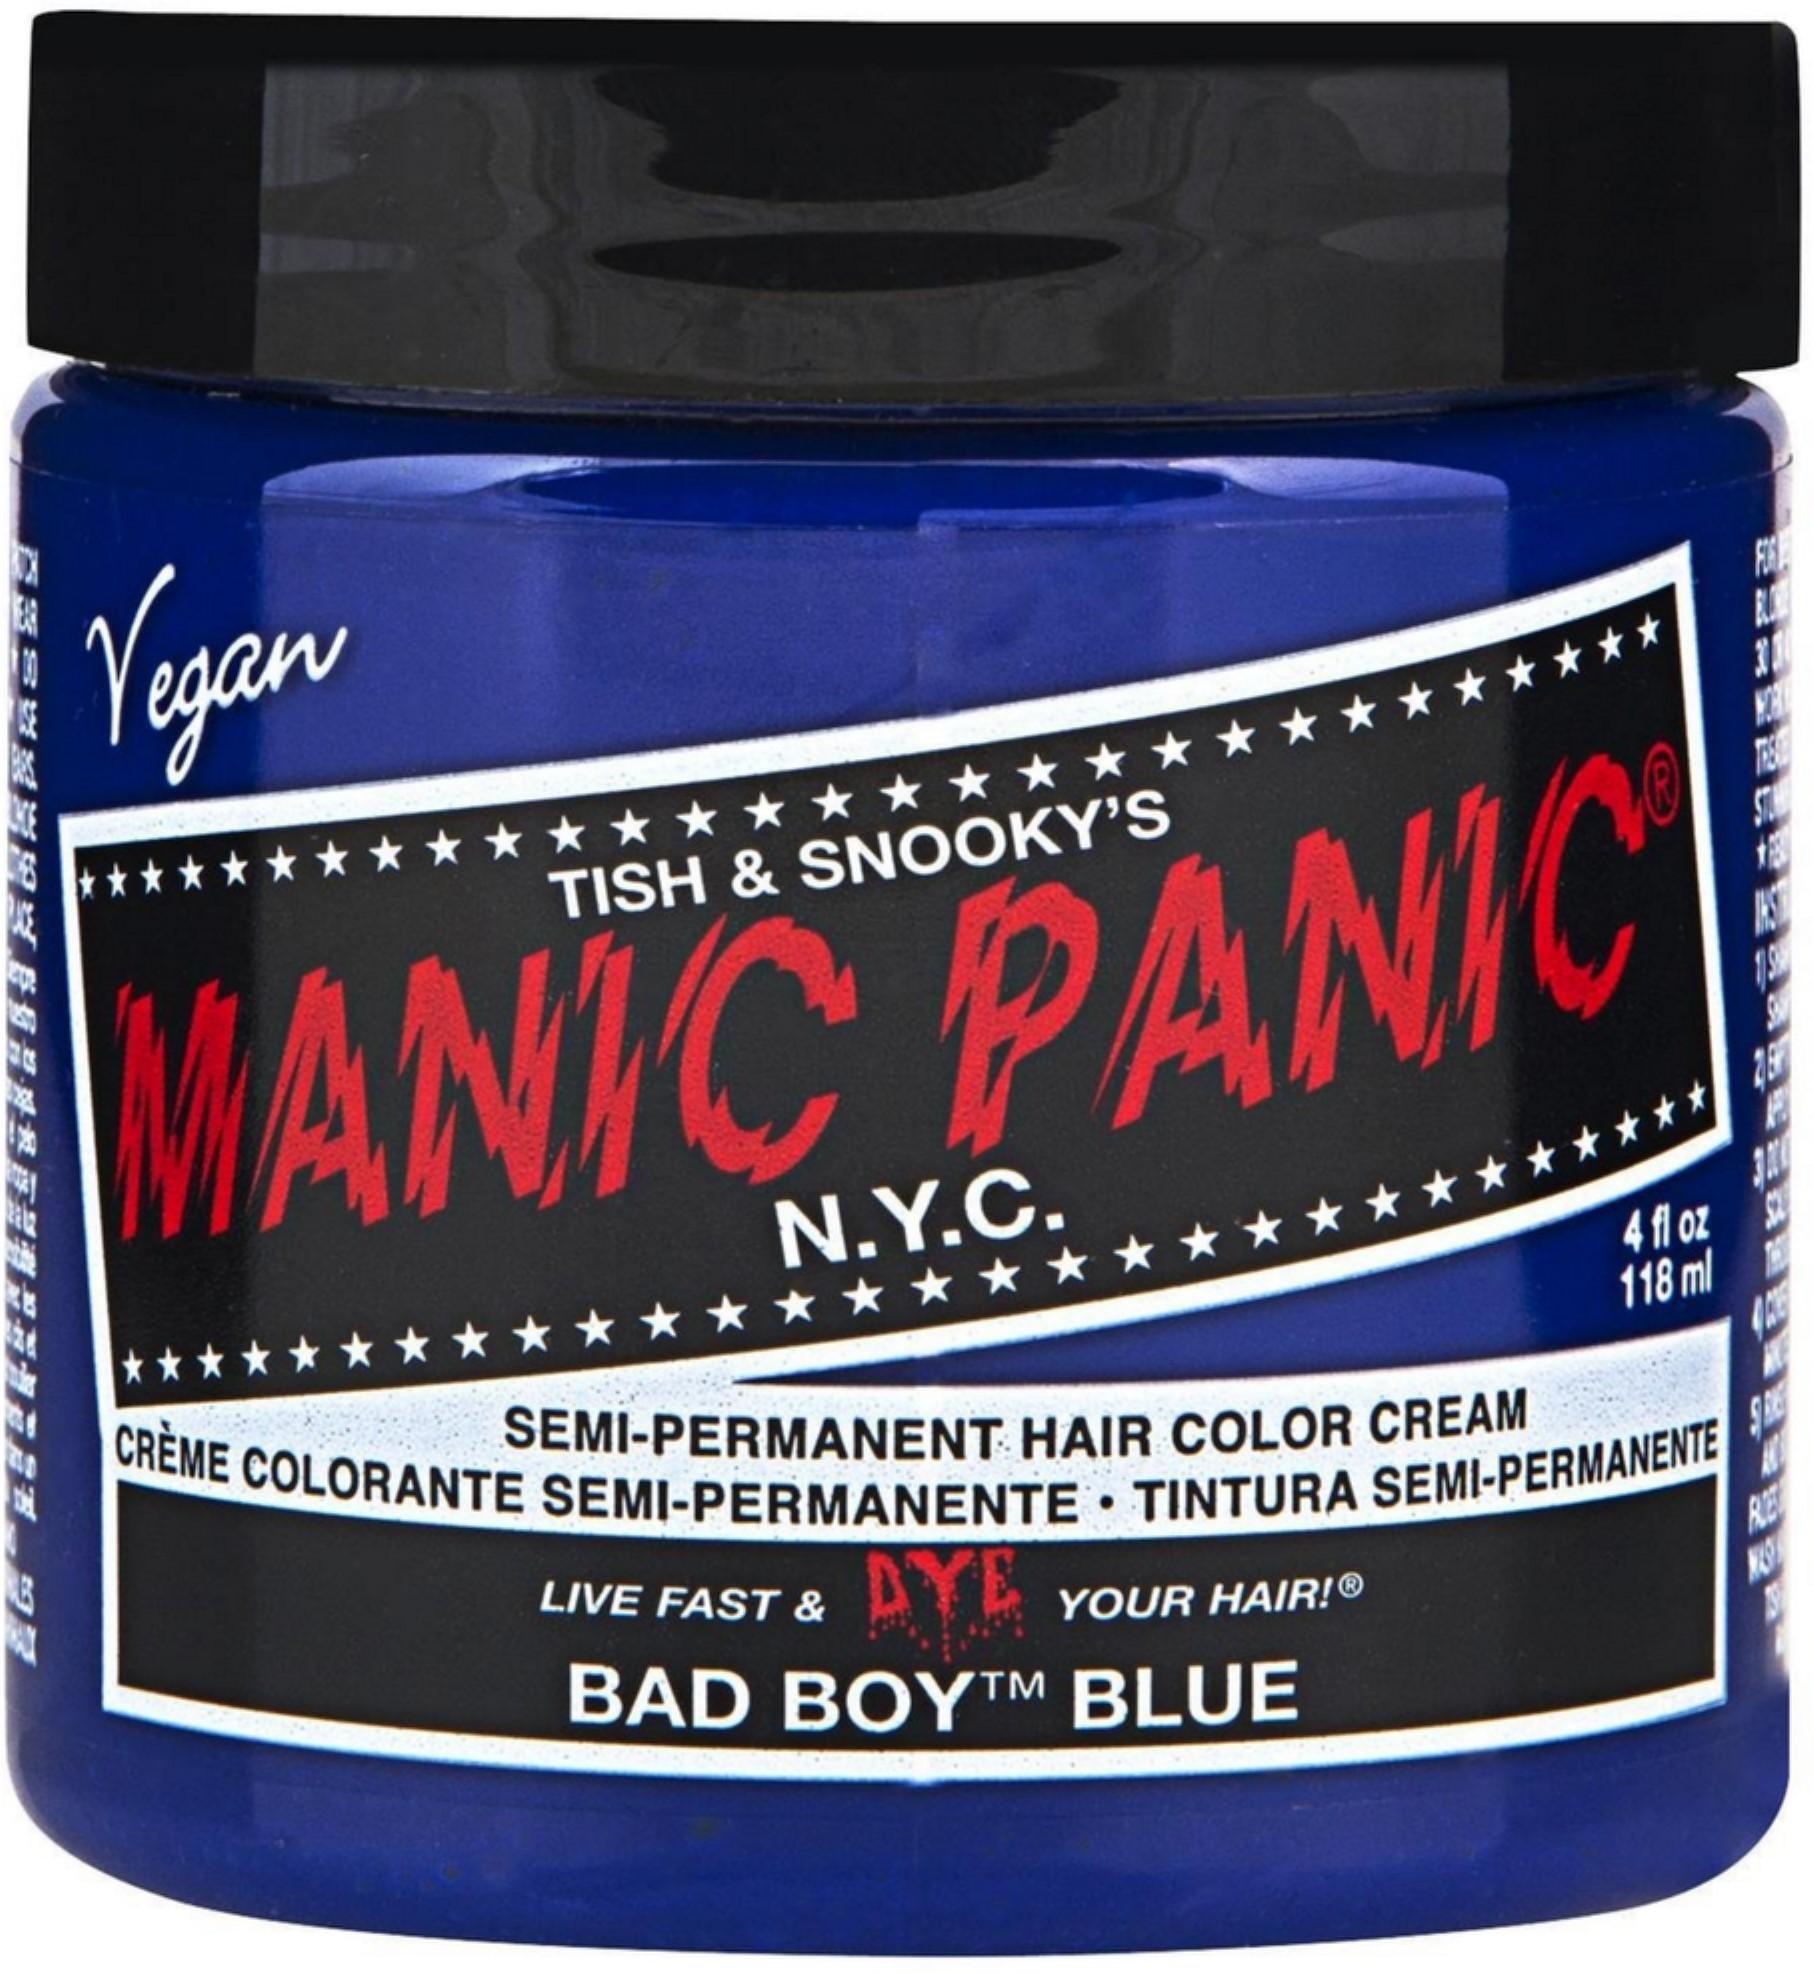 Manic Panic Semi-Permanent Hair Color Cream, Bad Boy Blue 4 oz